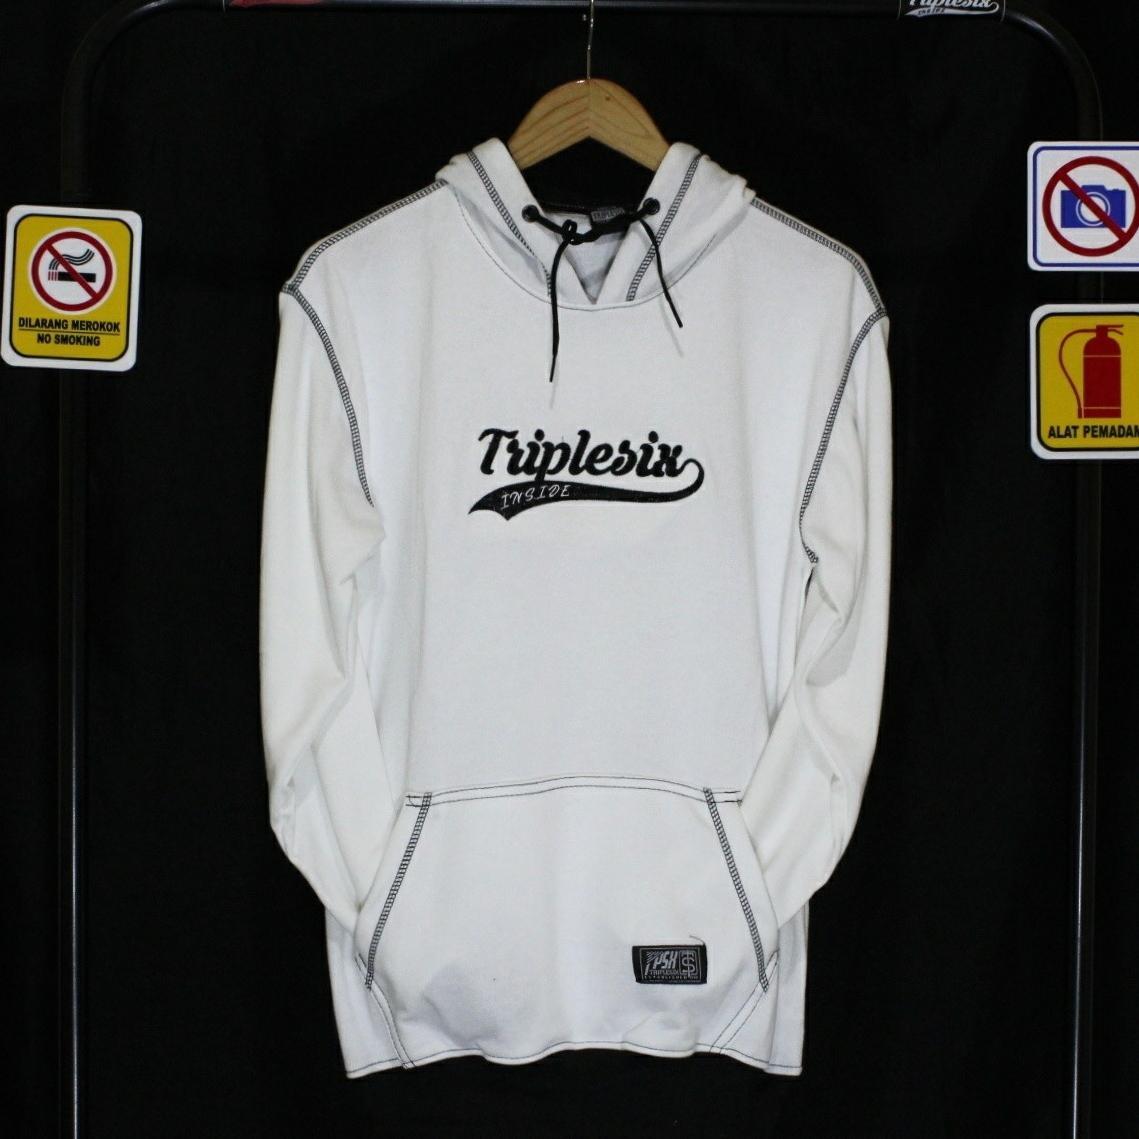 Fitur Jaket Kaos Sweater Lengan Pendek Hoodie Original Distro Jumper Cotton Ml Pria Wanita Bandung Triplesix Bahan Fleece Premium Size M L